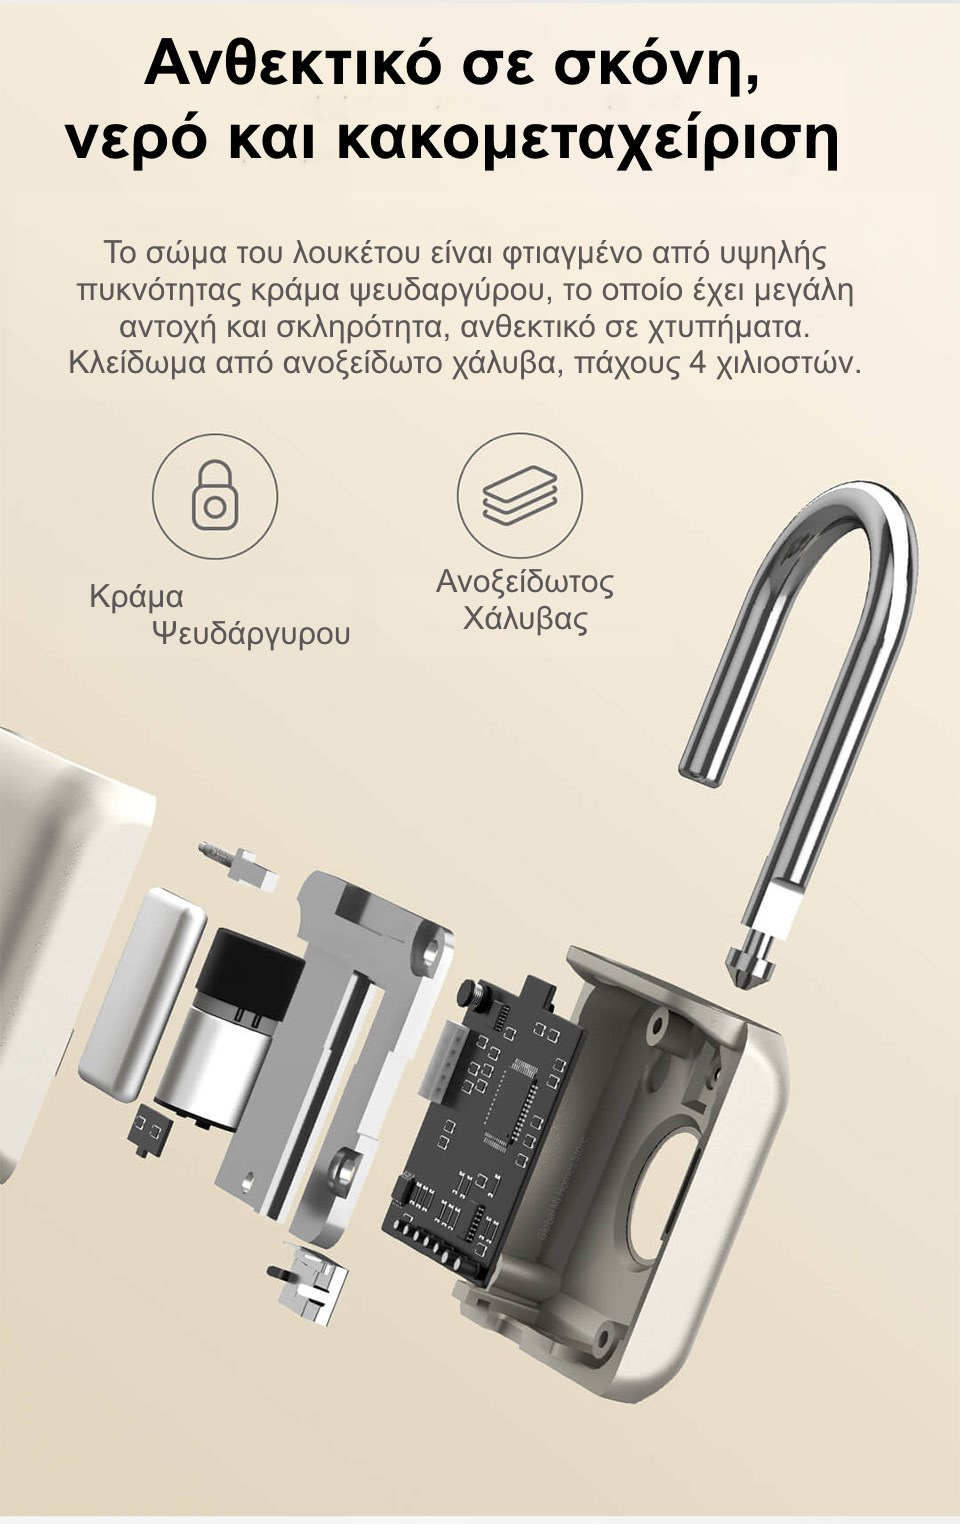 Xiaomi Mijia Λουκέτο με Δακτυλικό Αποτύπωμα, δεν σκουριάζει, ανθεκτικό